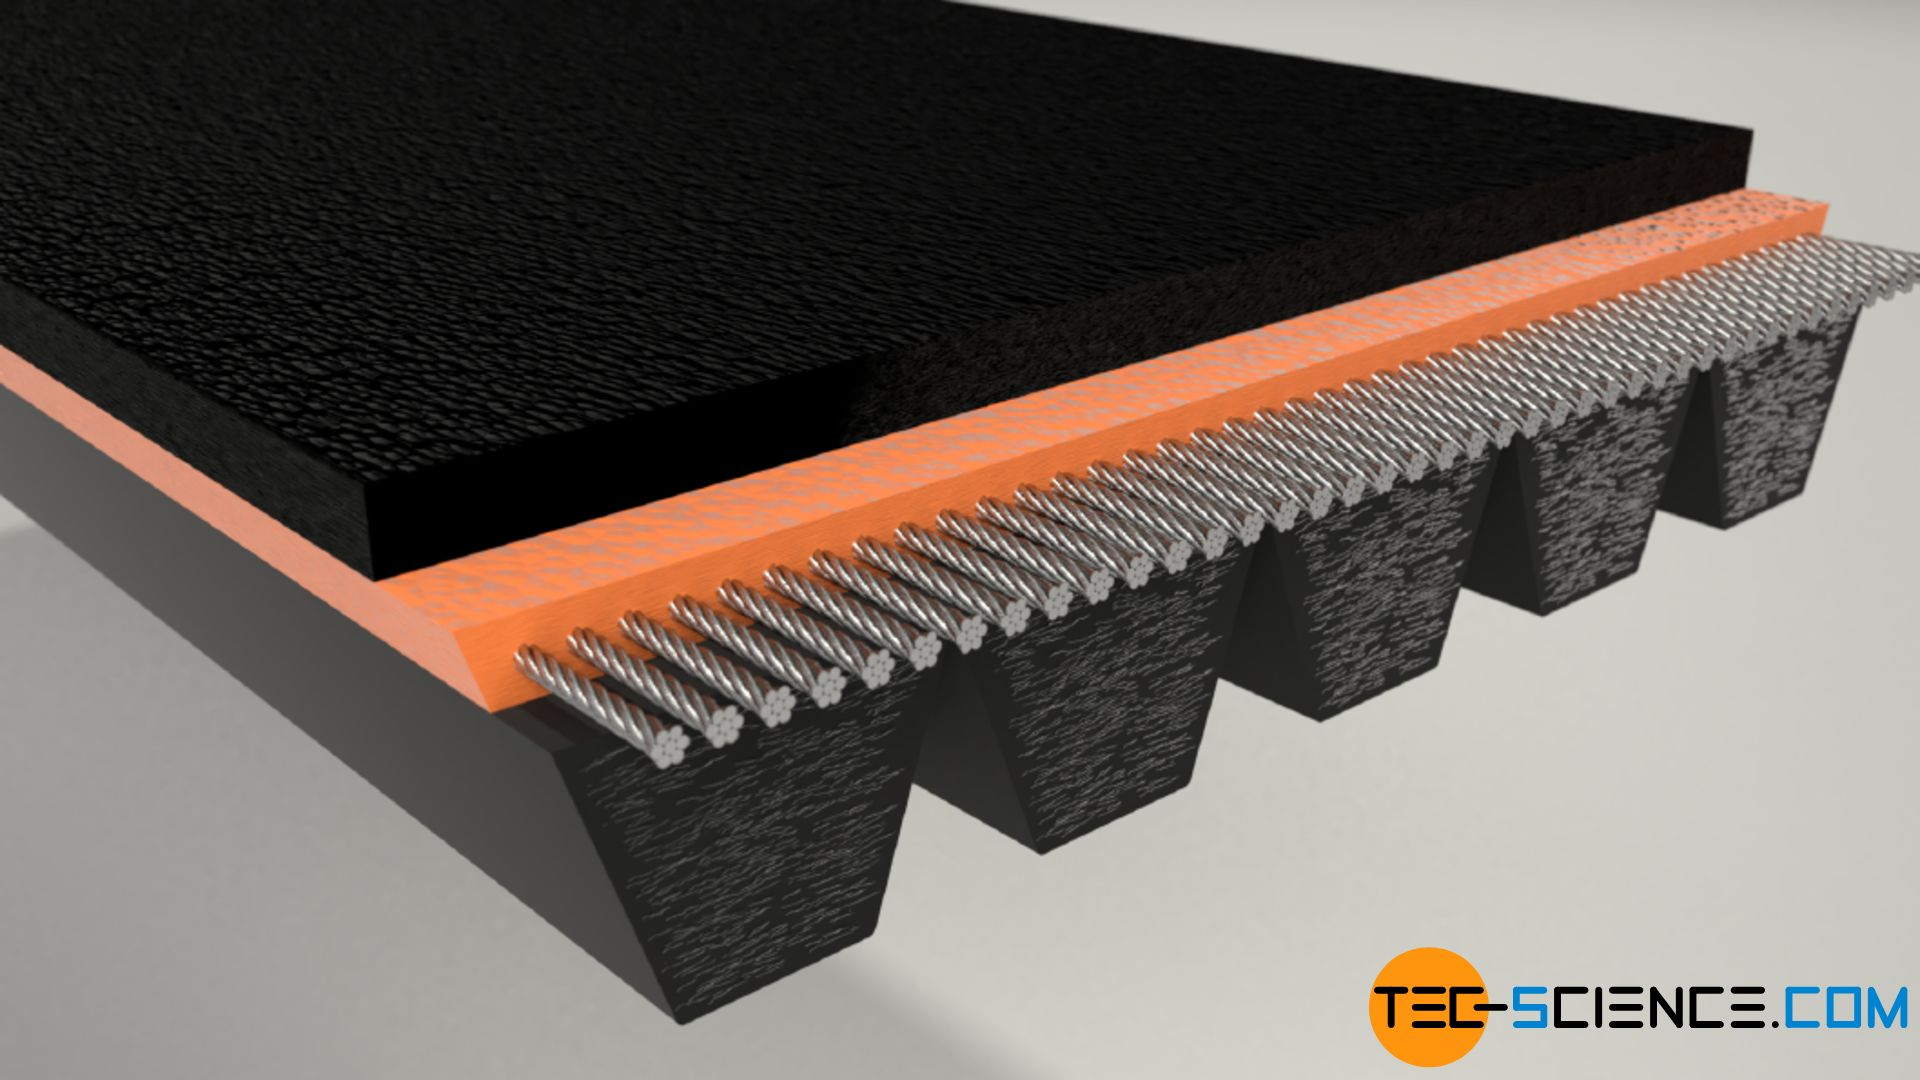 Raw edge poly v-belt (serpentine belt)